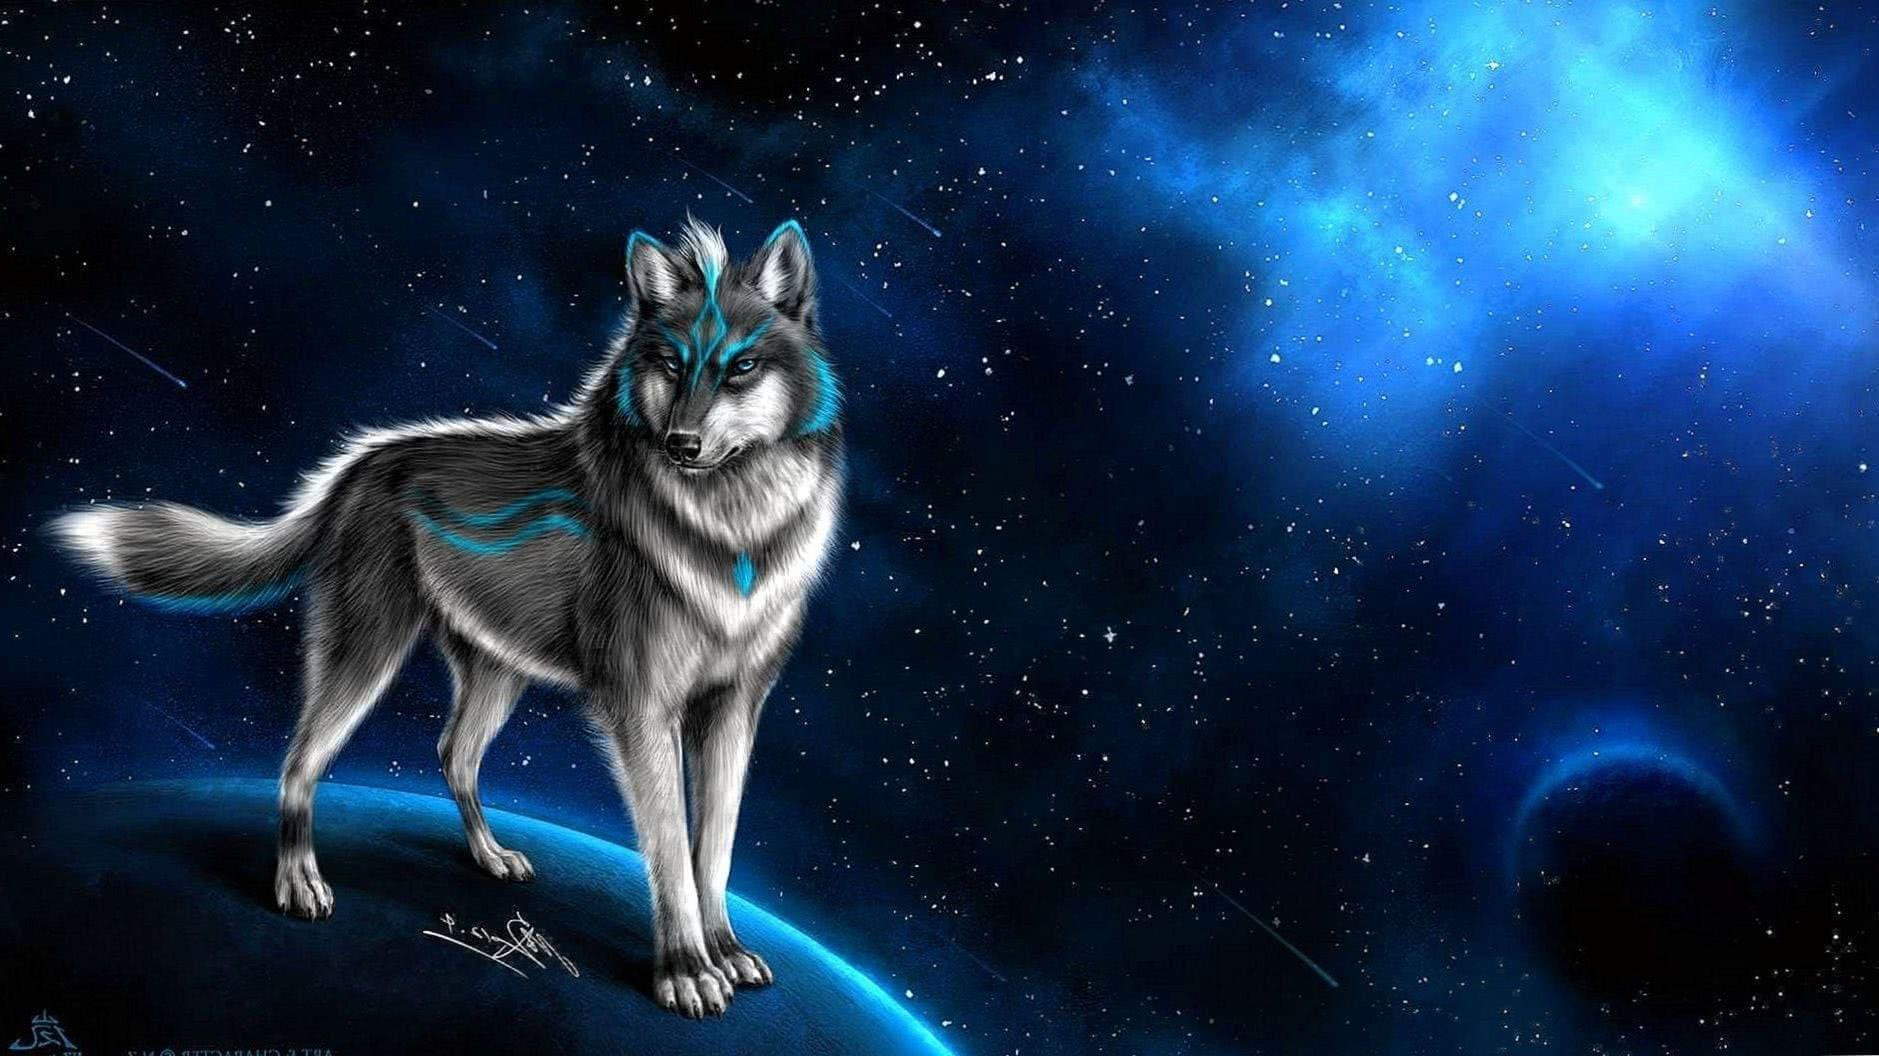 Wallpaper Of A Wolf